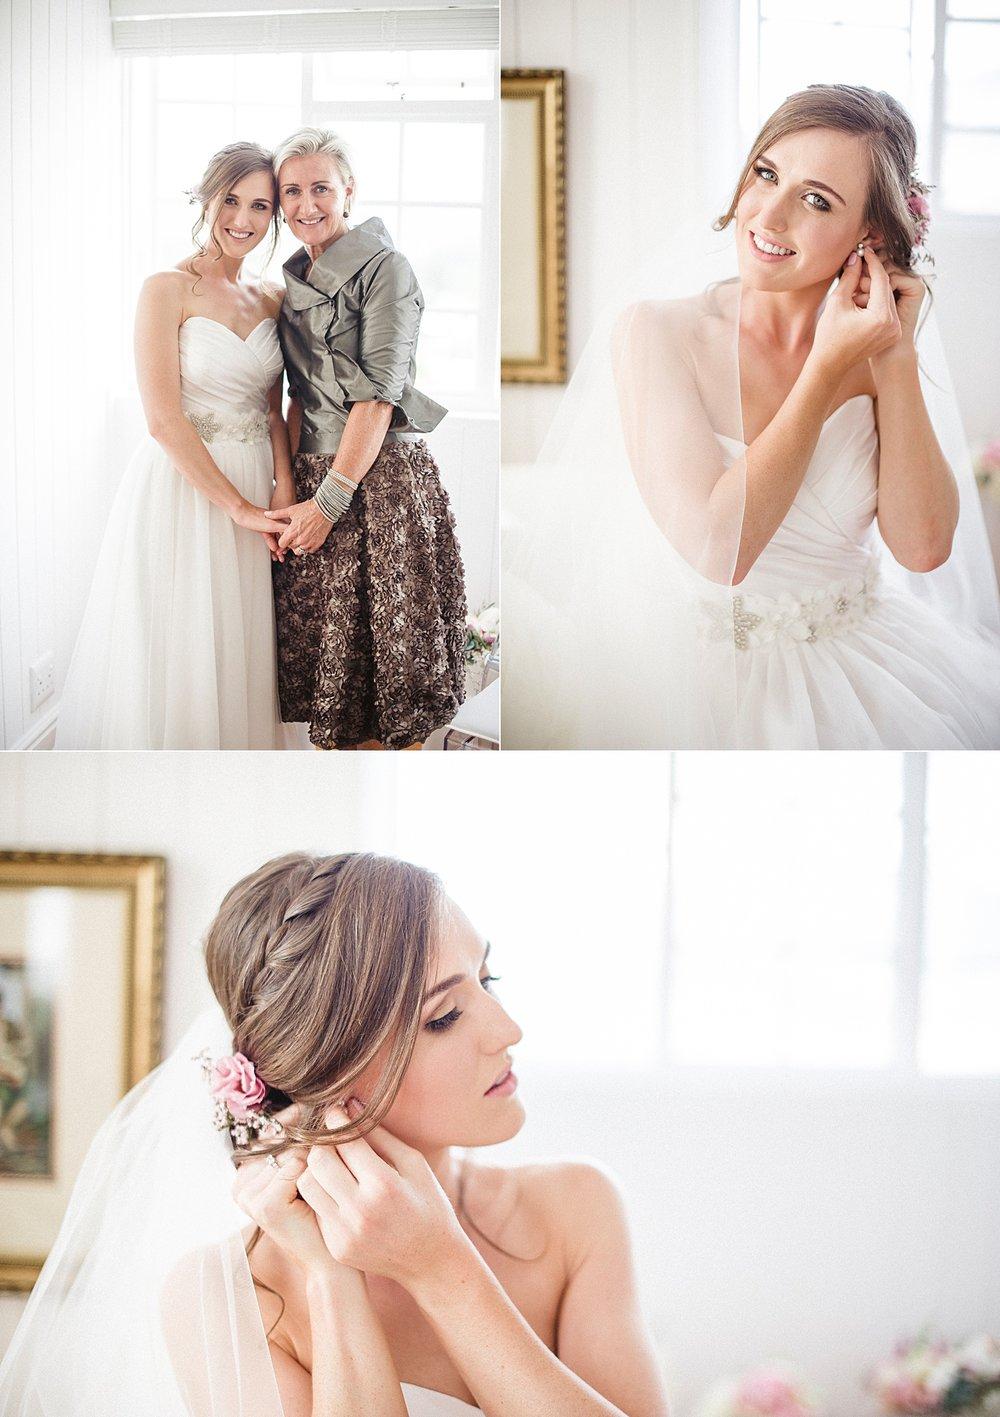 RyanParker_WeddingPhotographer_CapeTown_BonaDea_Hermanus_S&A_DSC_1442.jpg